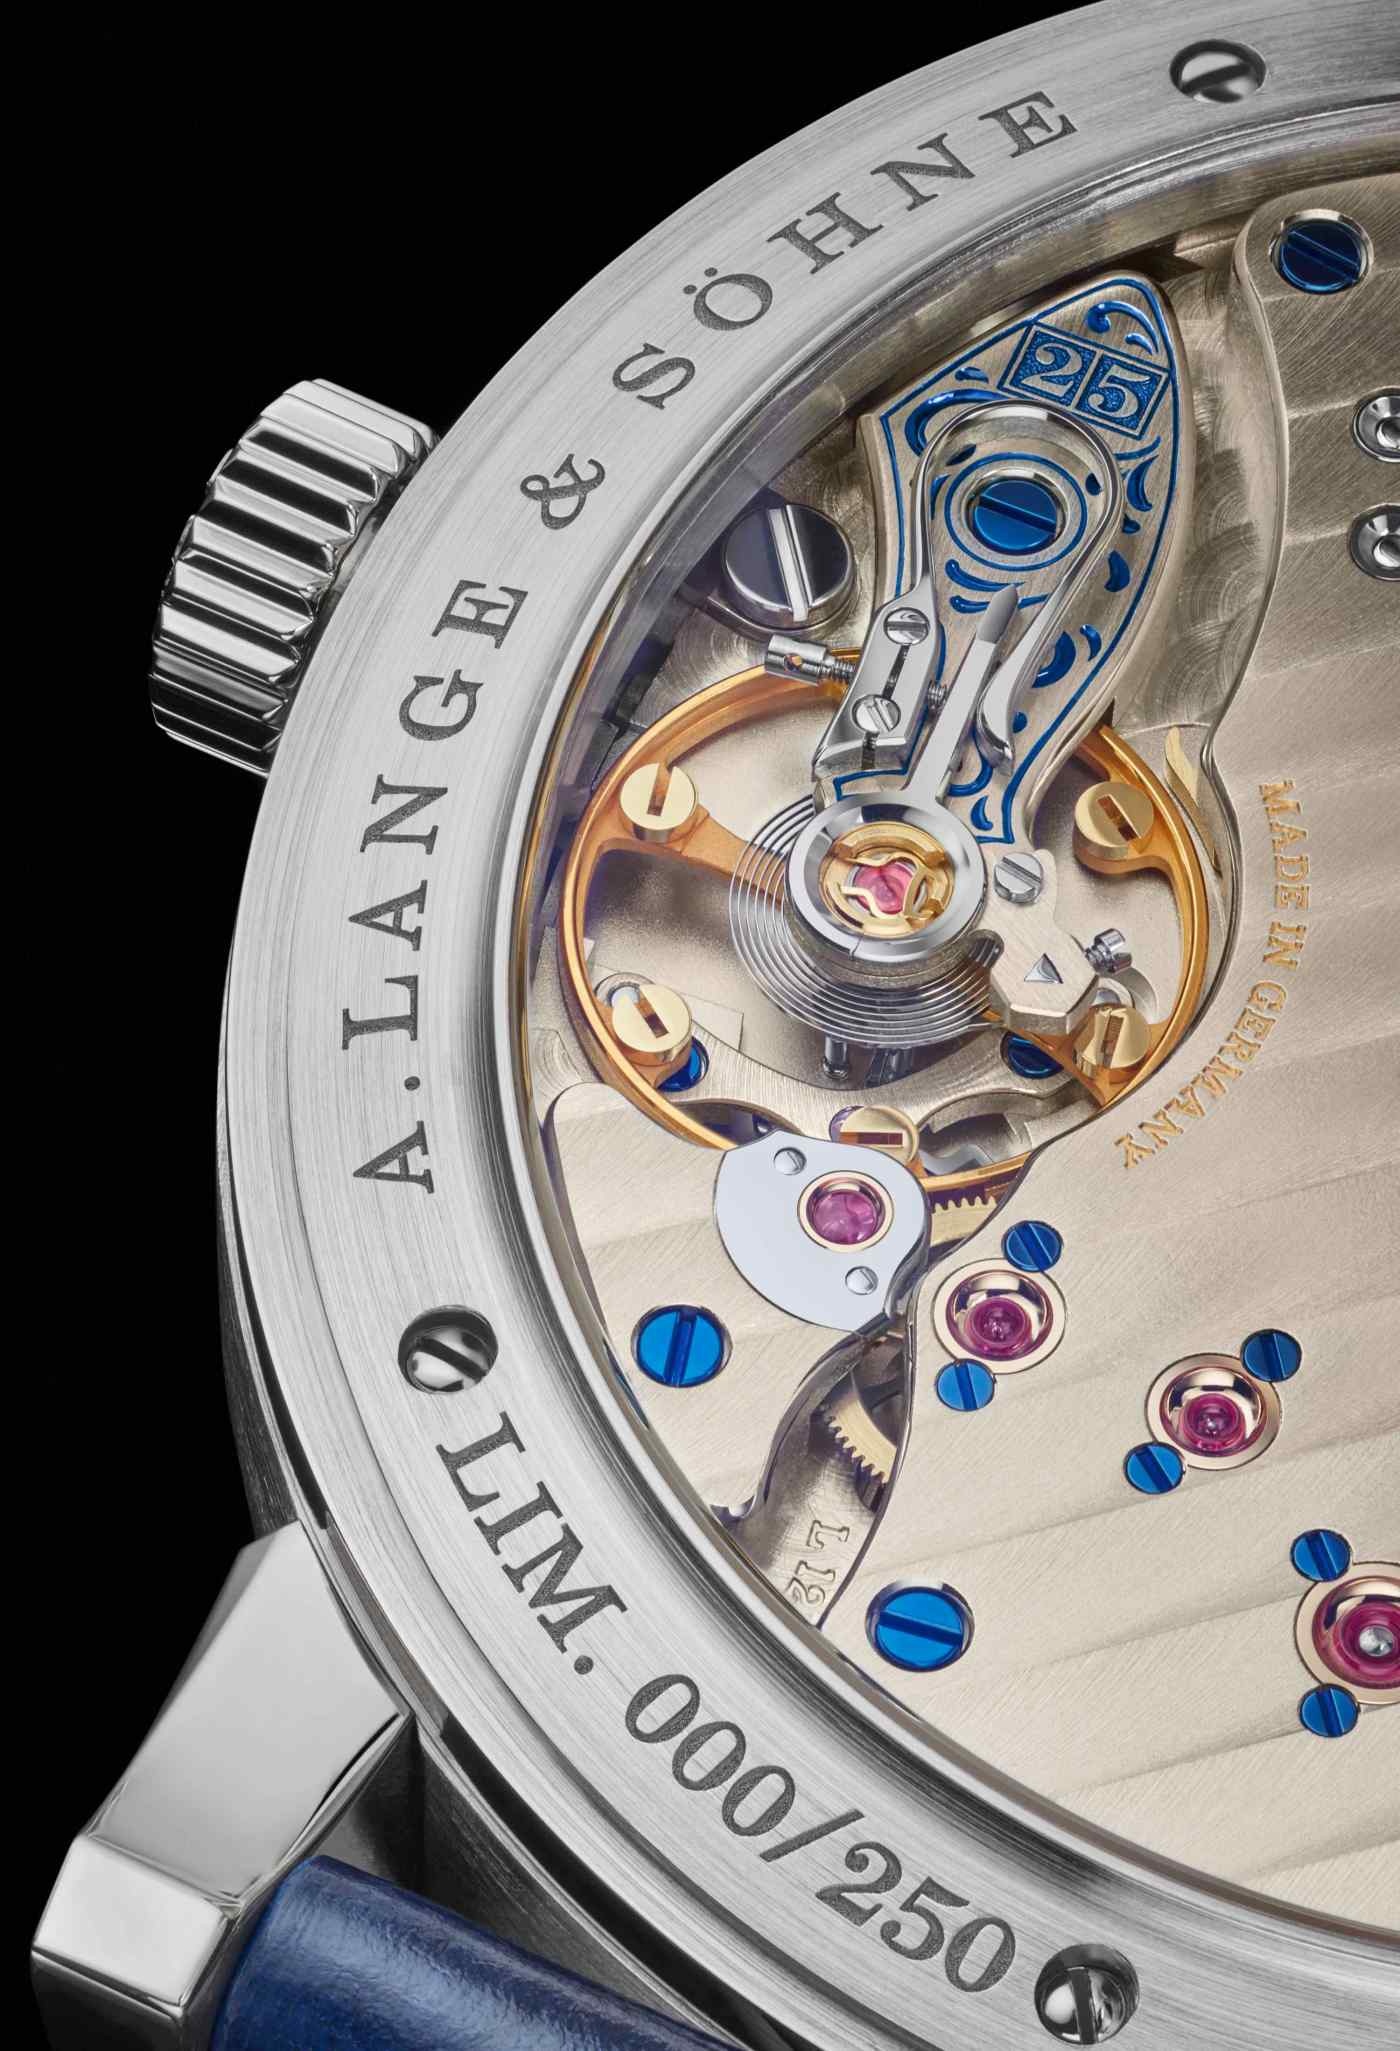 Lange 1 25th Anniversary oscillator close-up